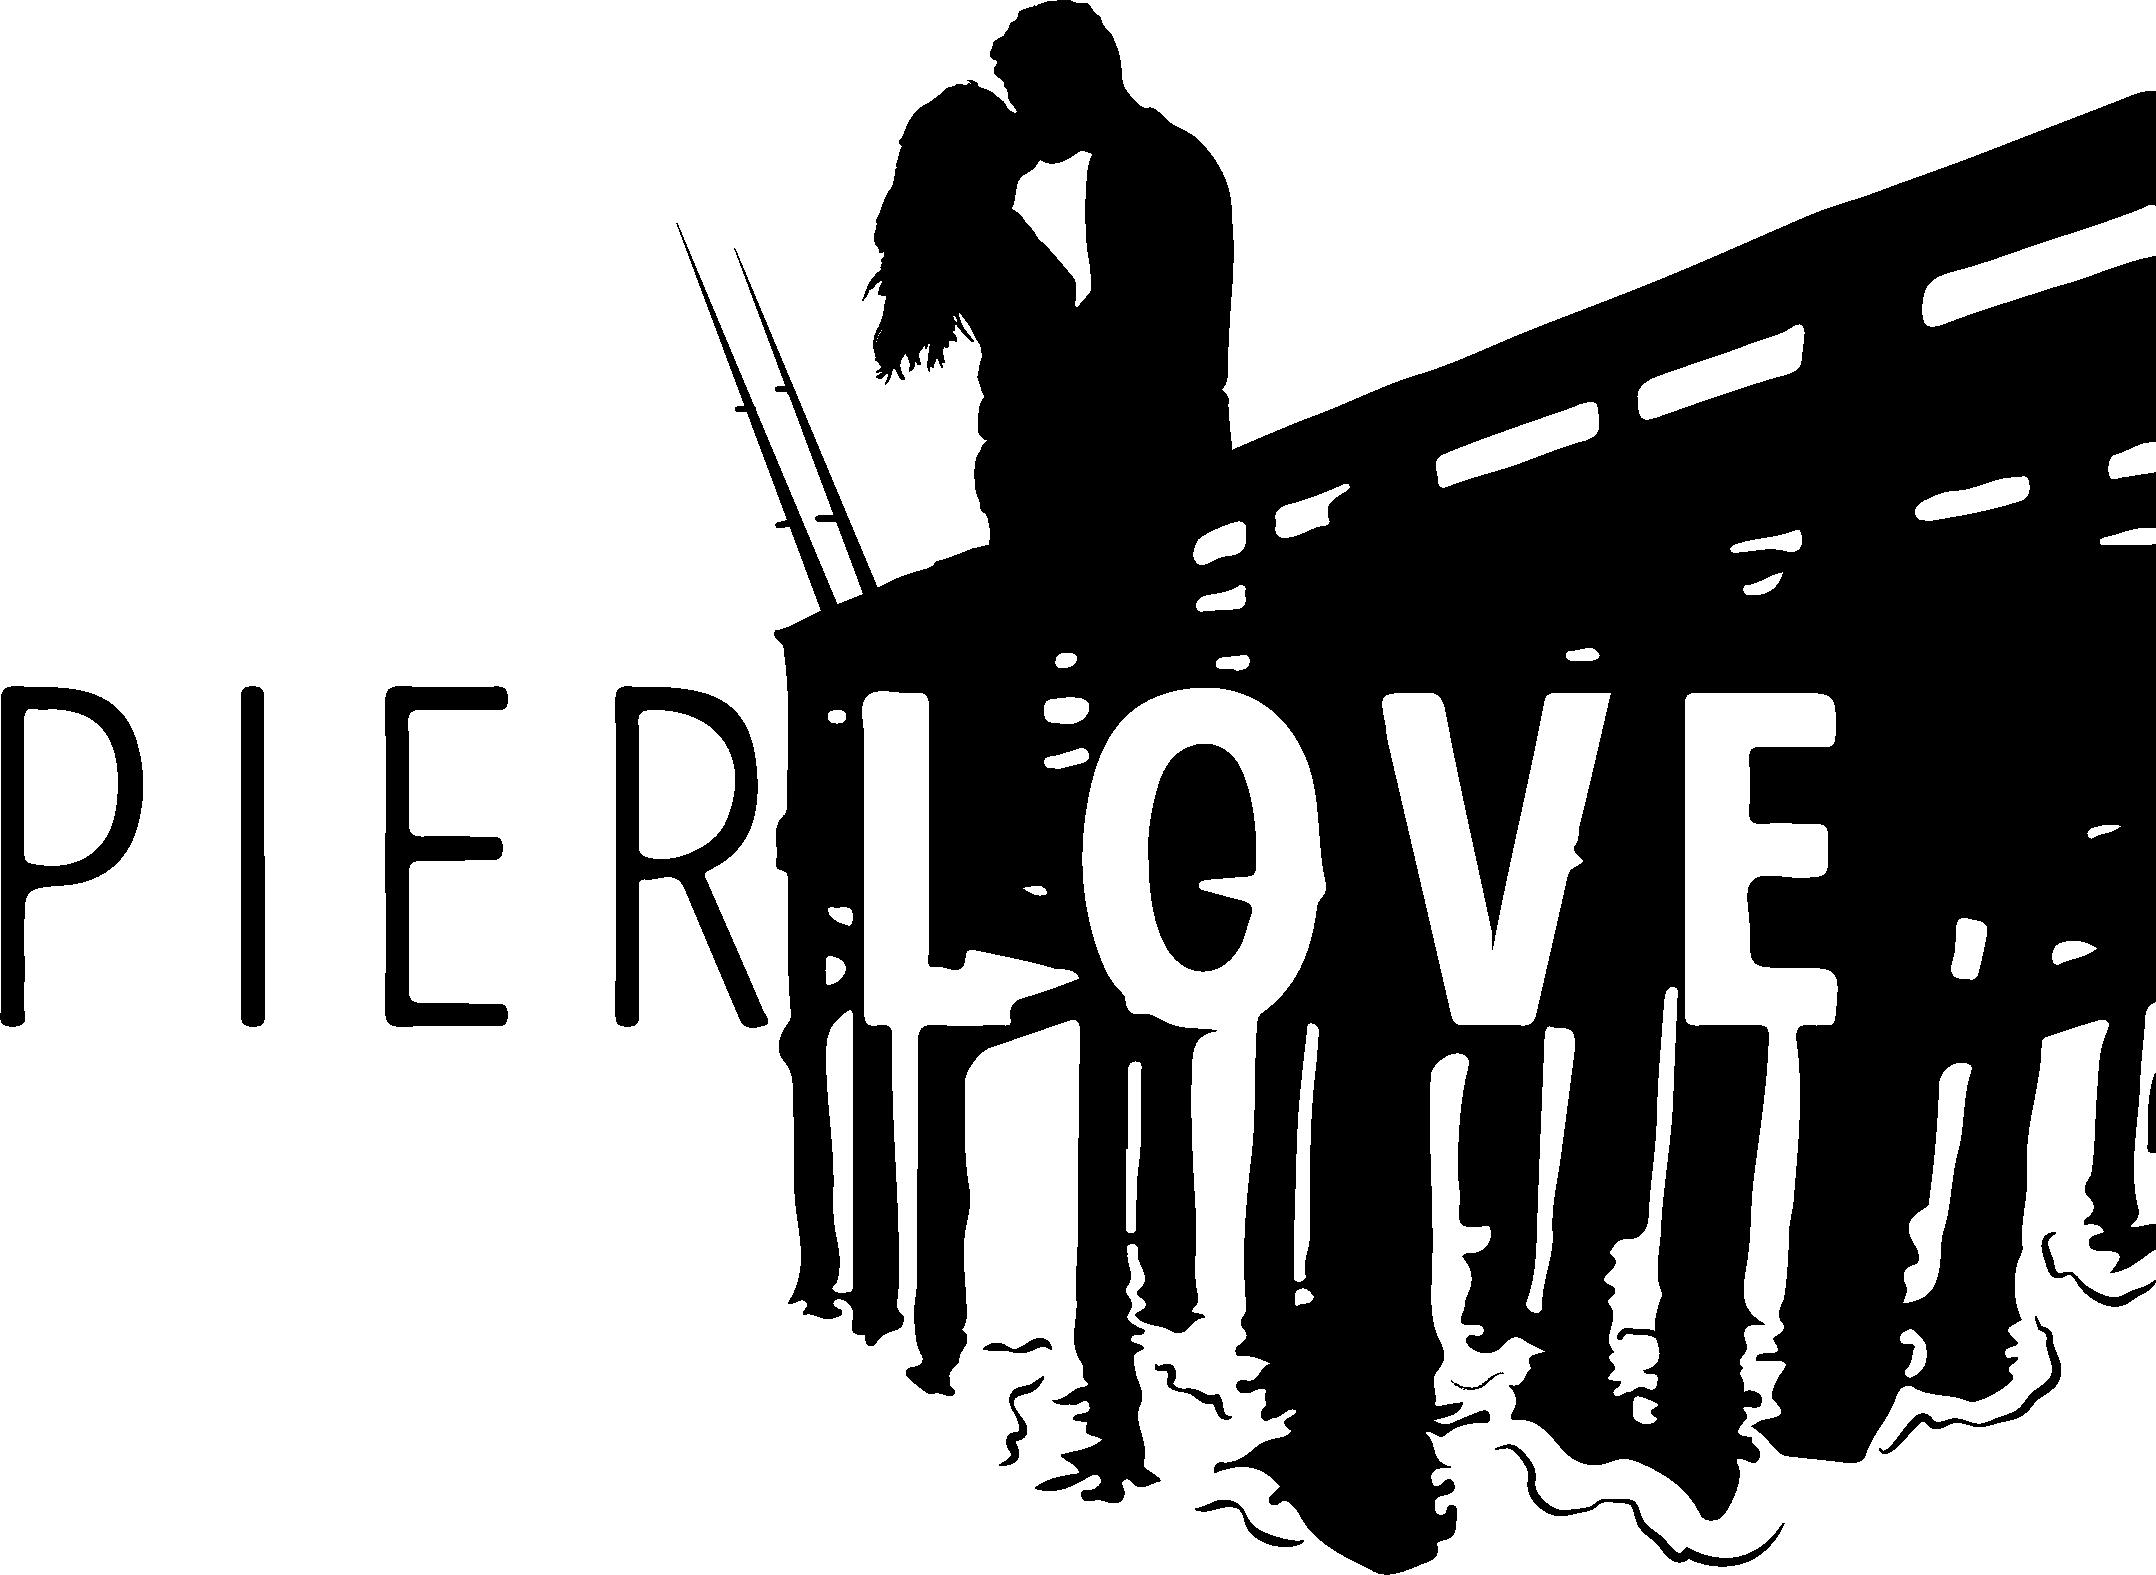 Pier Love Media, Inc